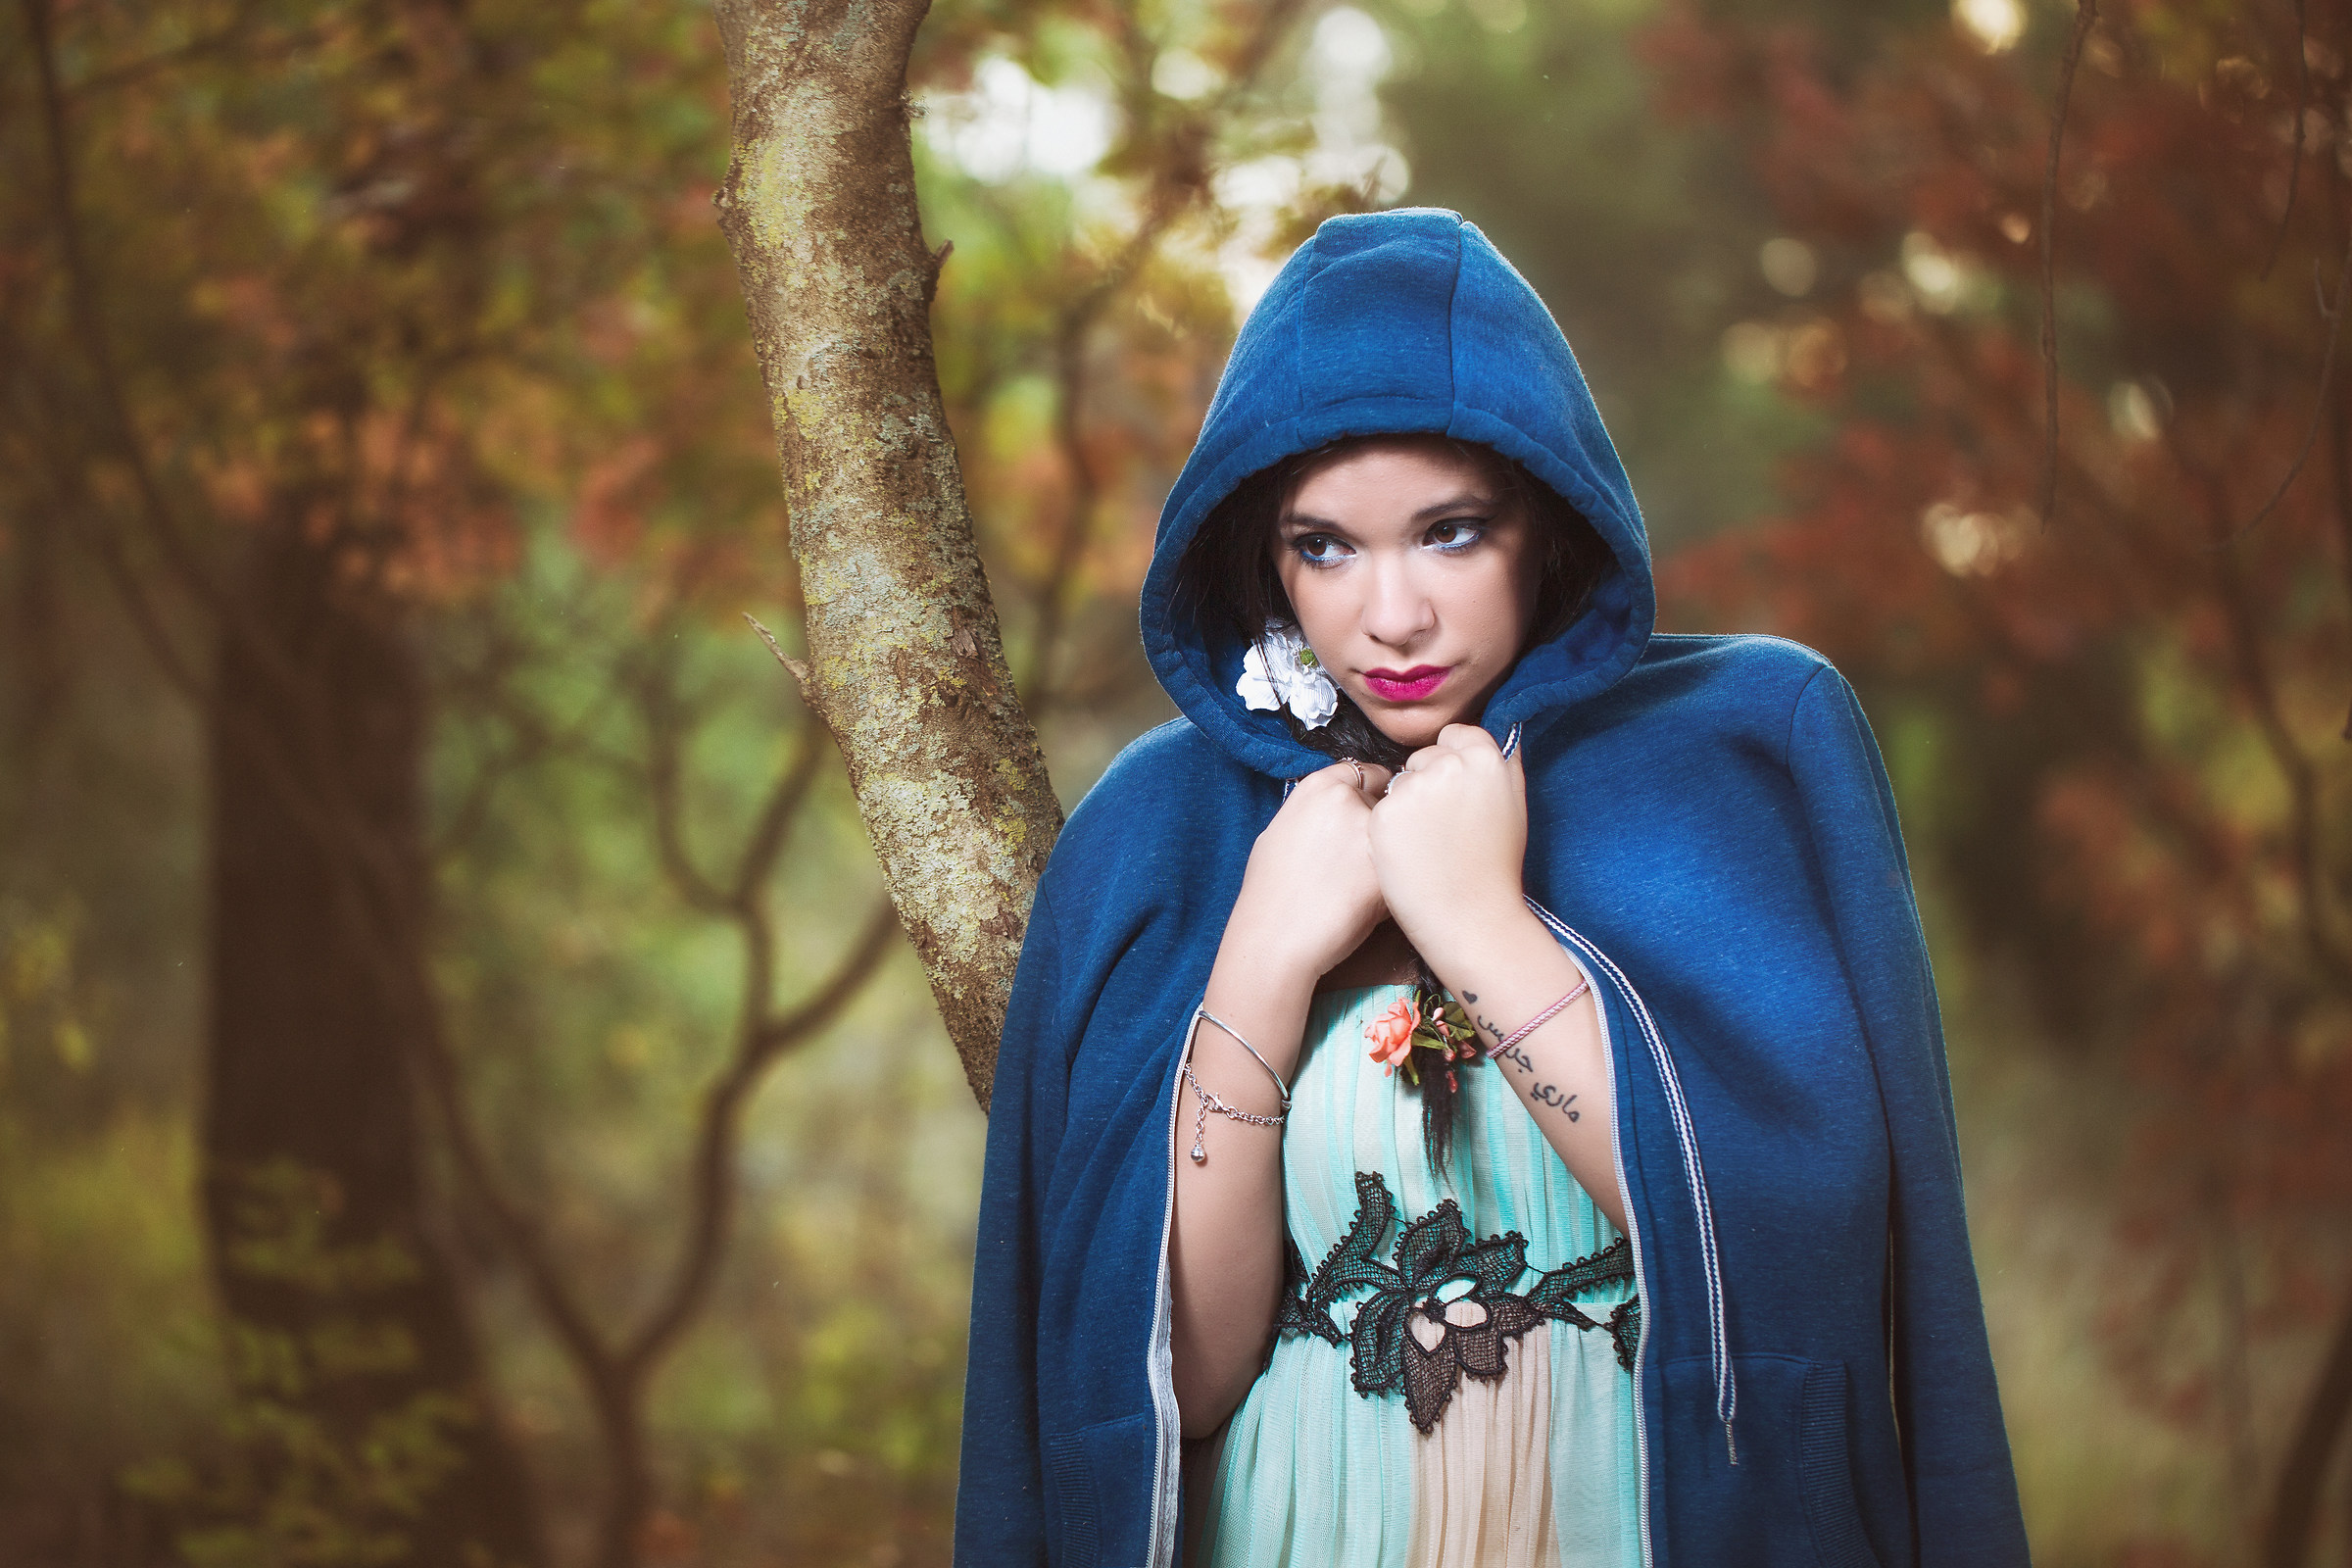 Blue Riding Hood?...